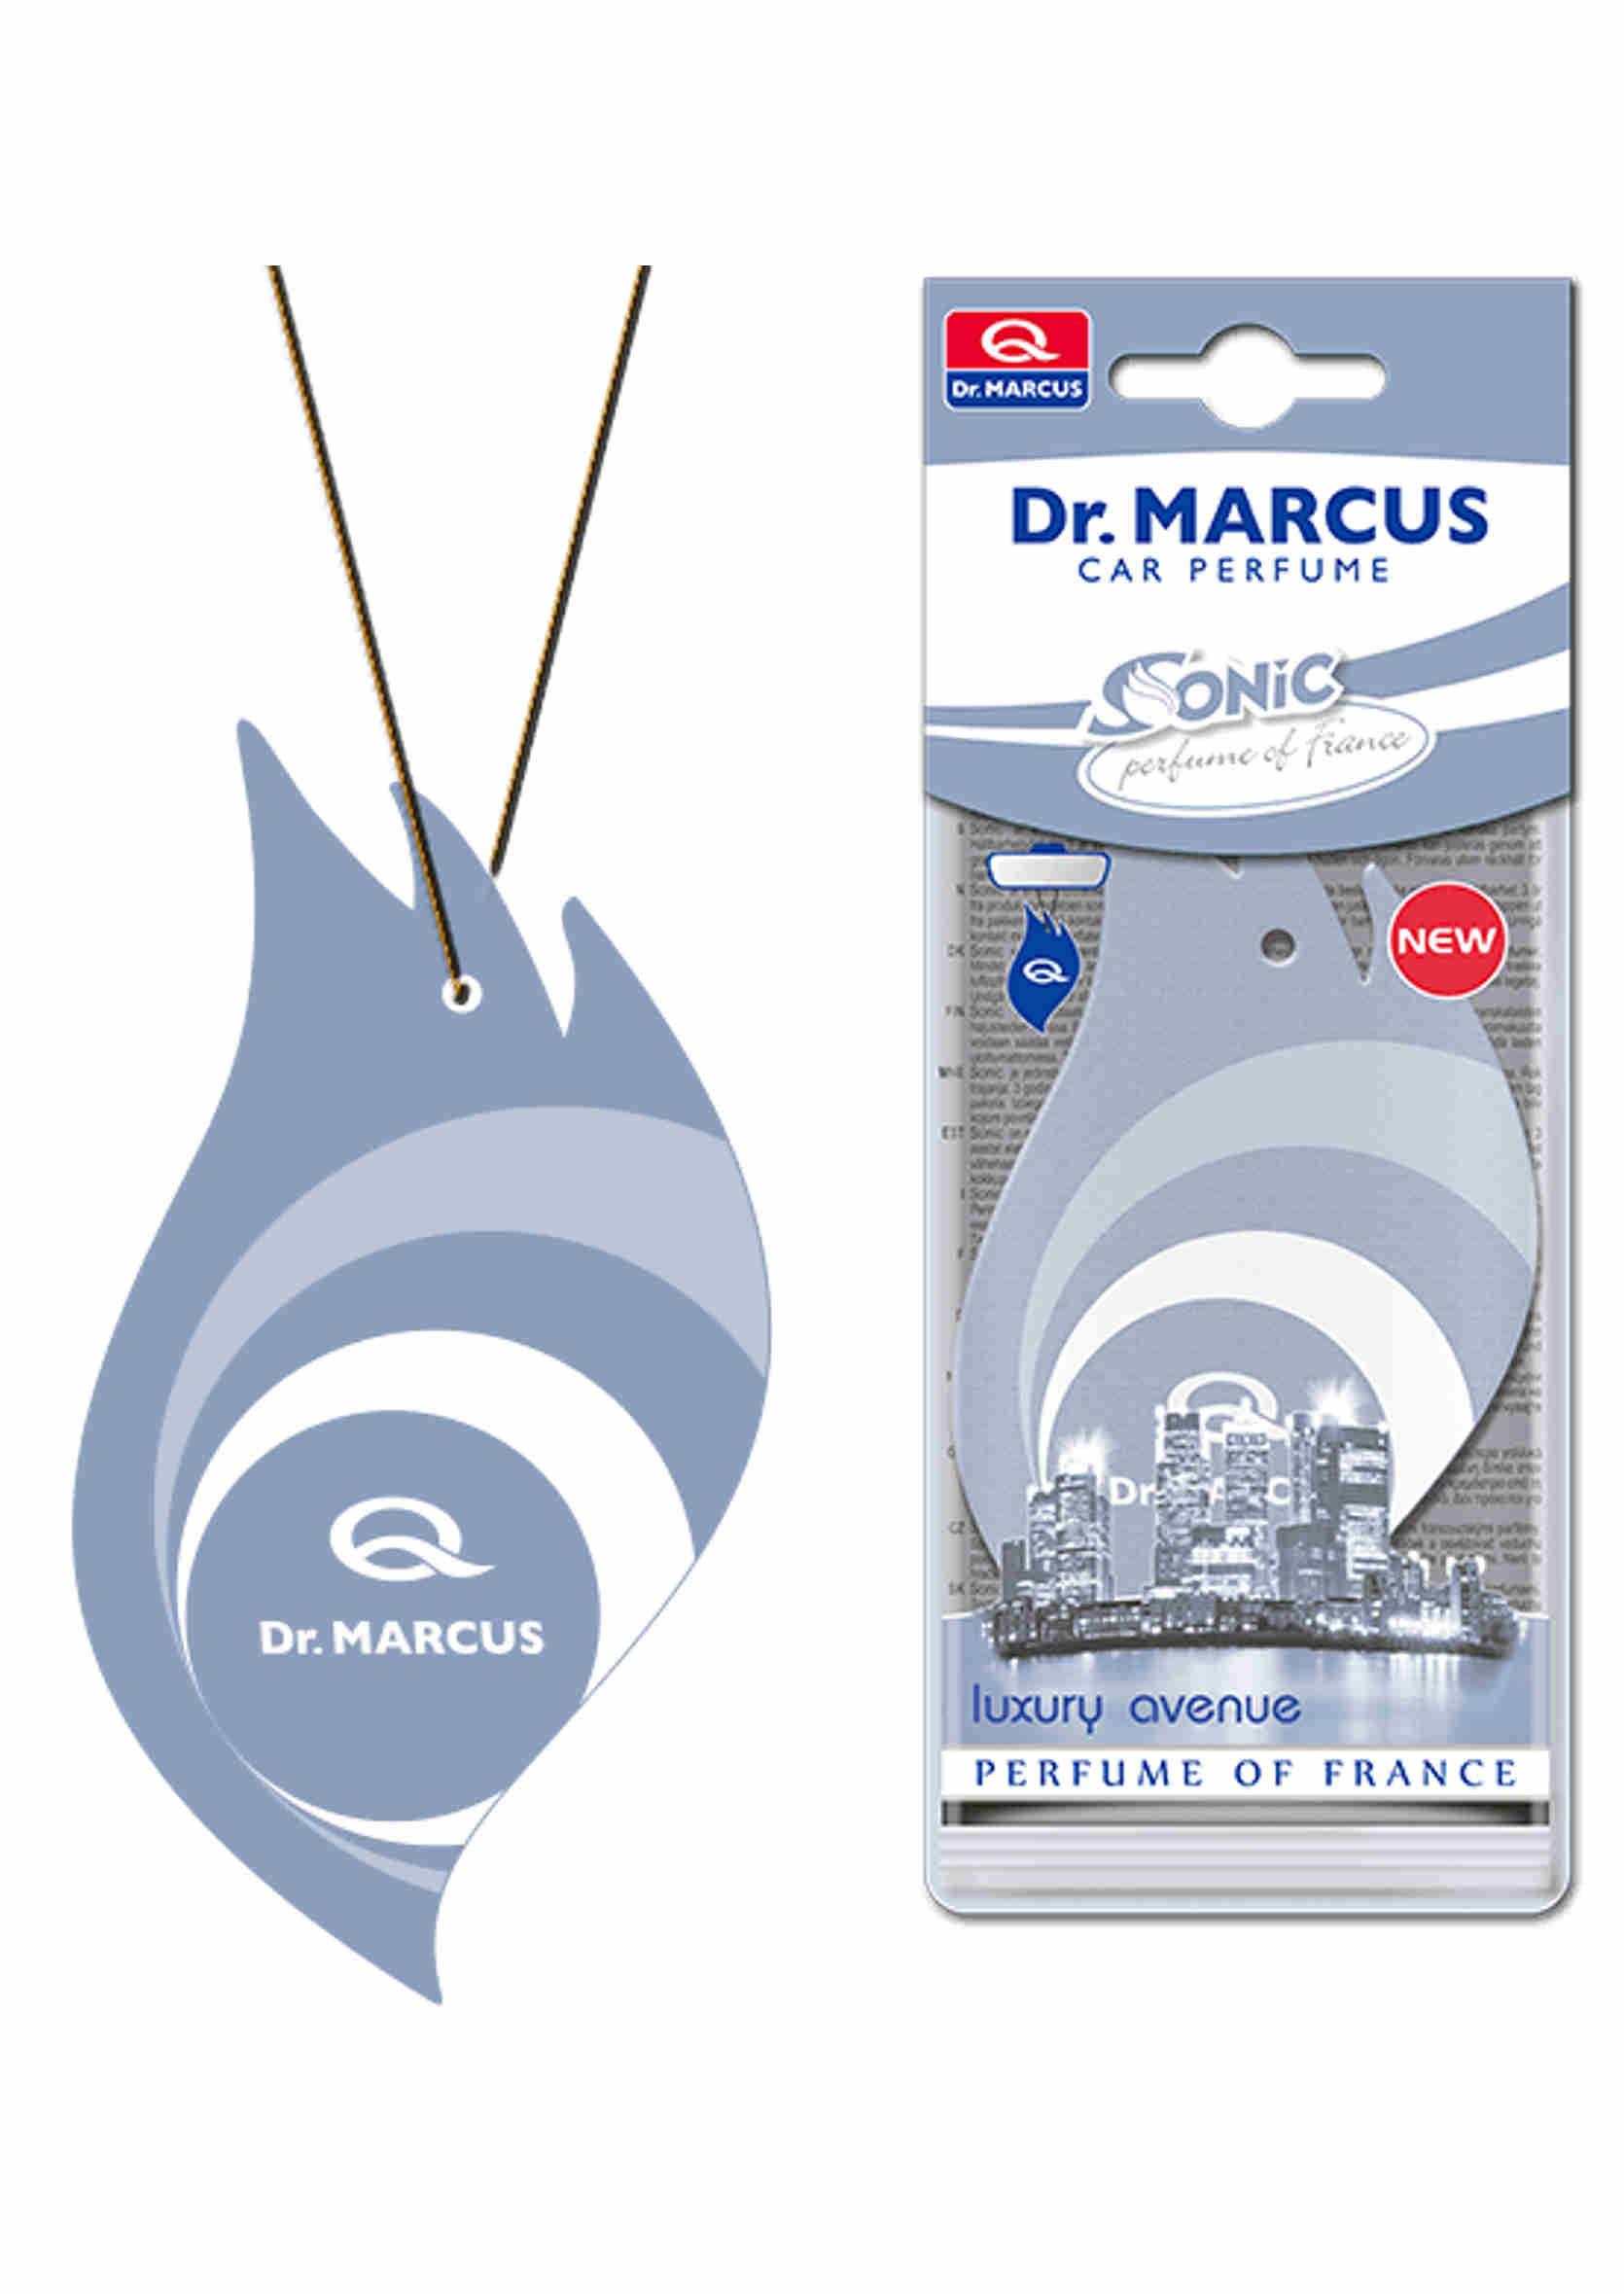 Dr. Marcus Sonic Luxury Avenue Listek Zapachowy Choinka Perfumowana